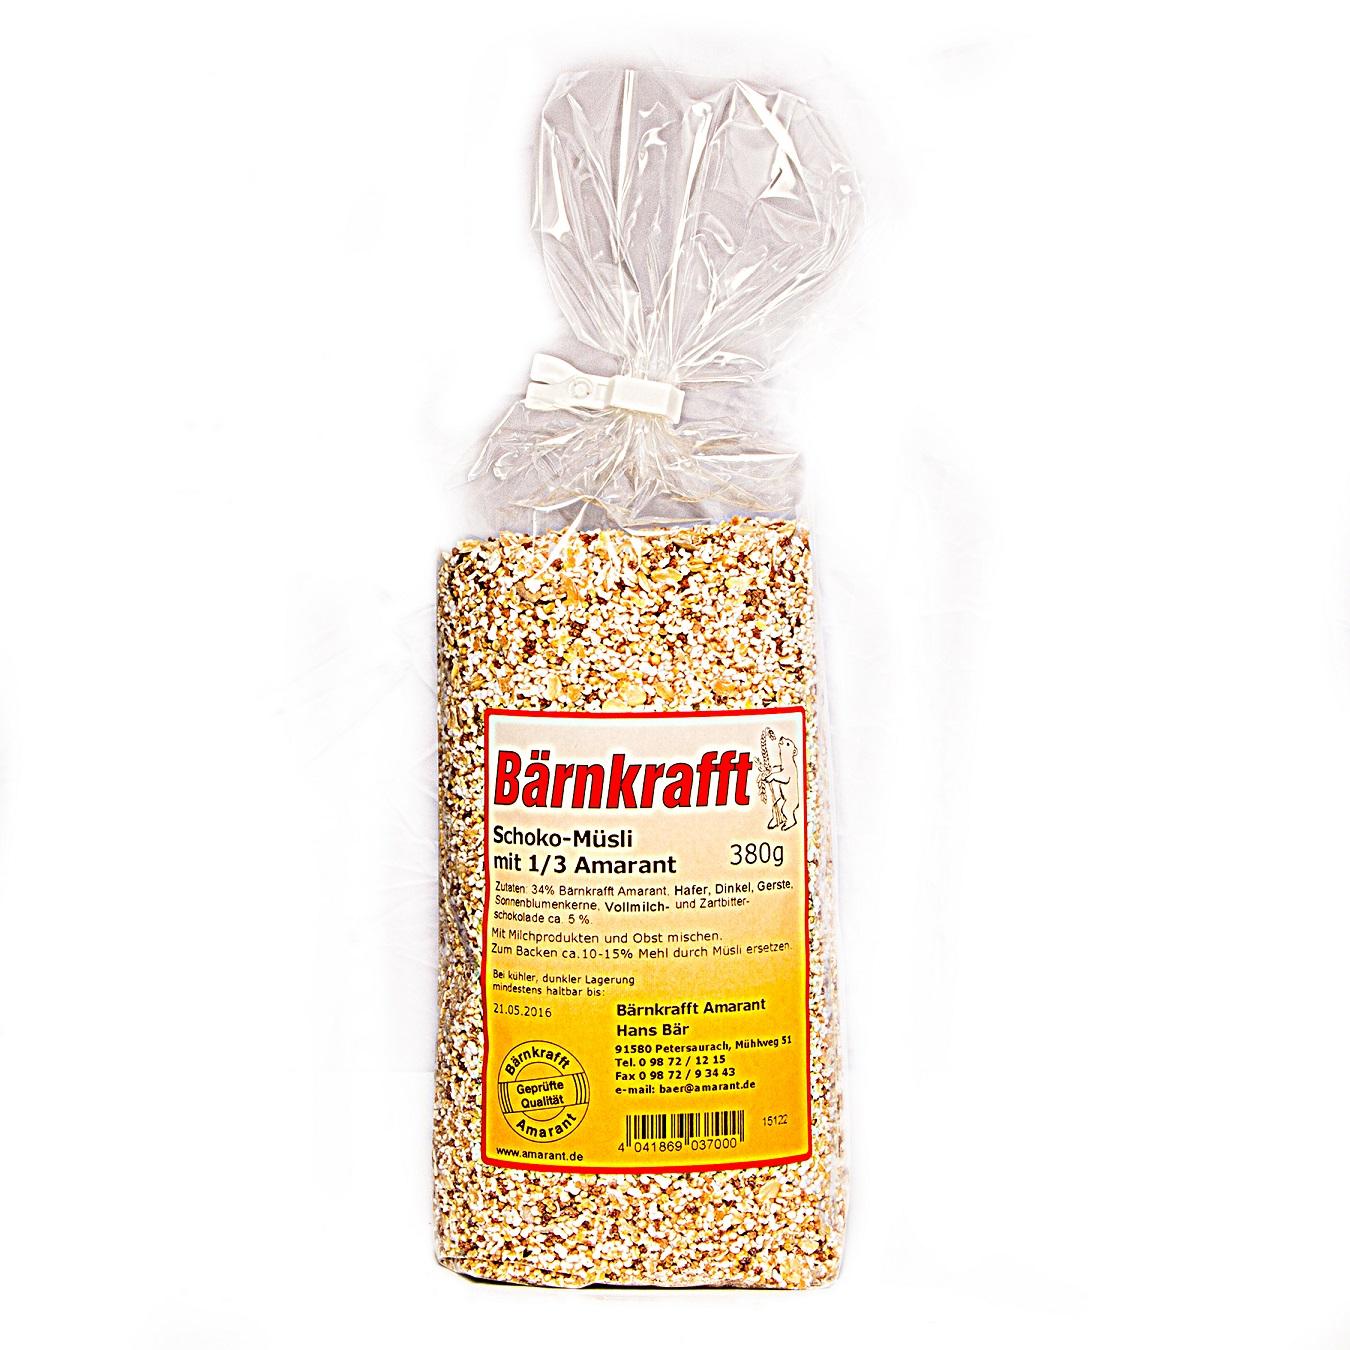 Schoko-Müsli mit Amarant